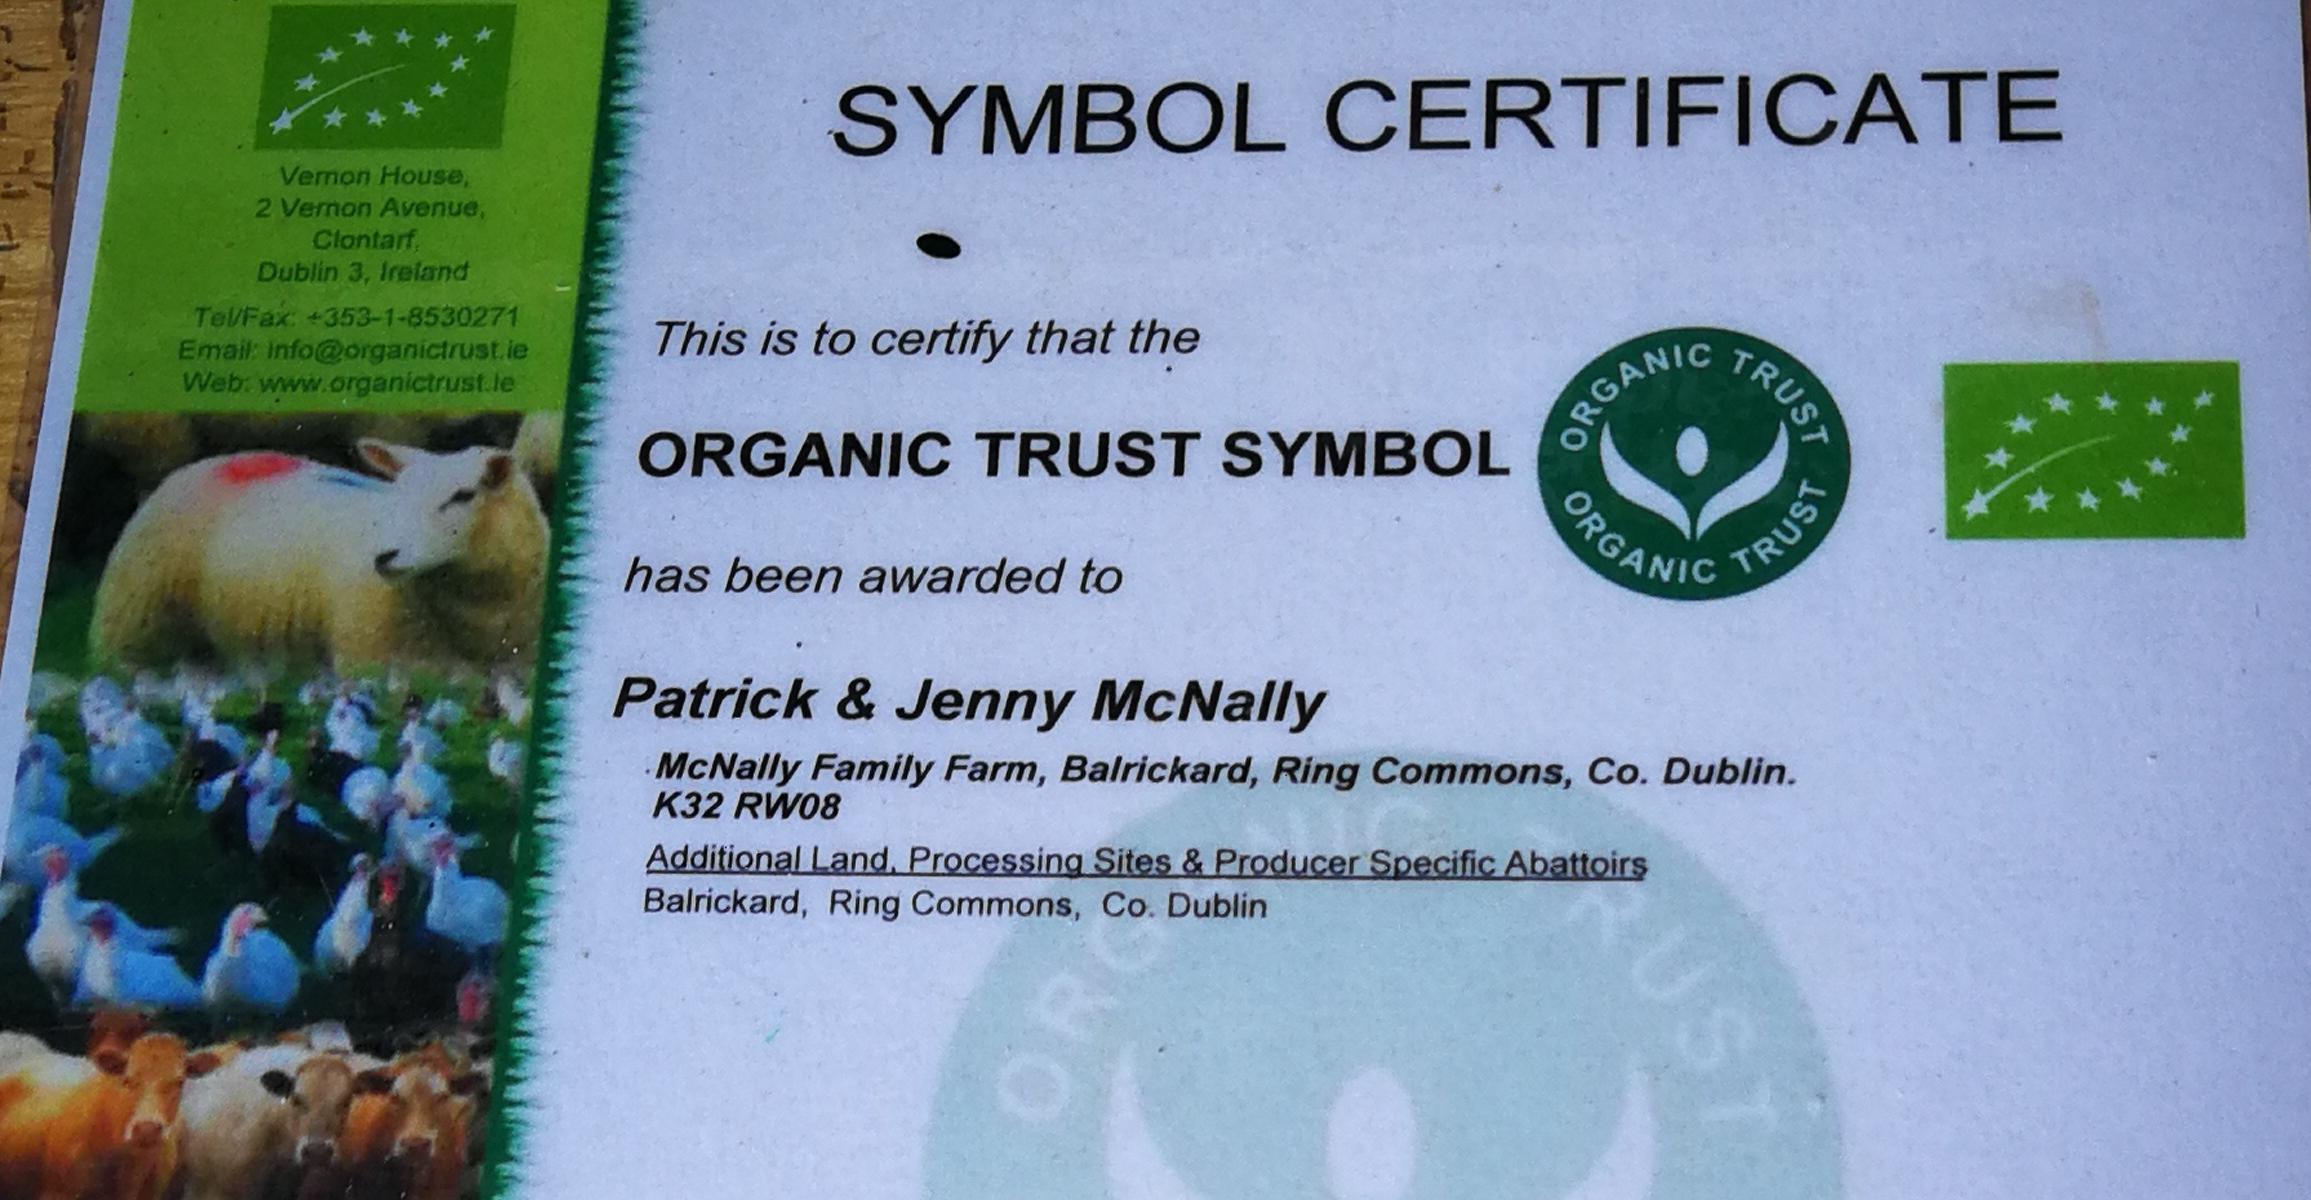 McNally Family Farm Organic Trust Certificate